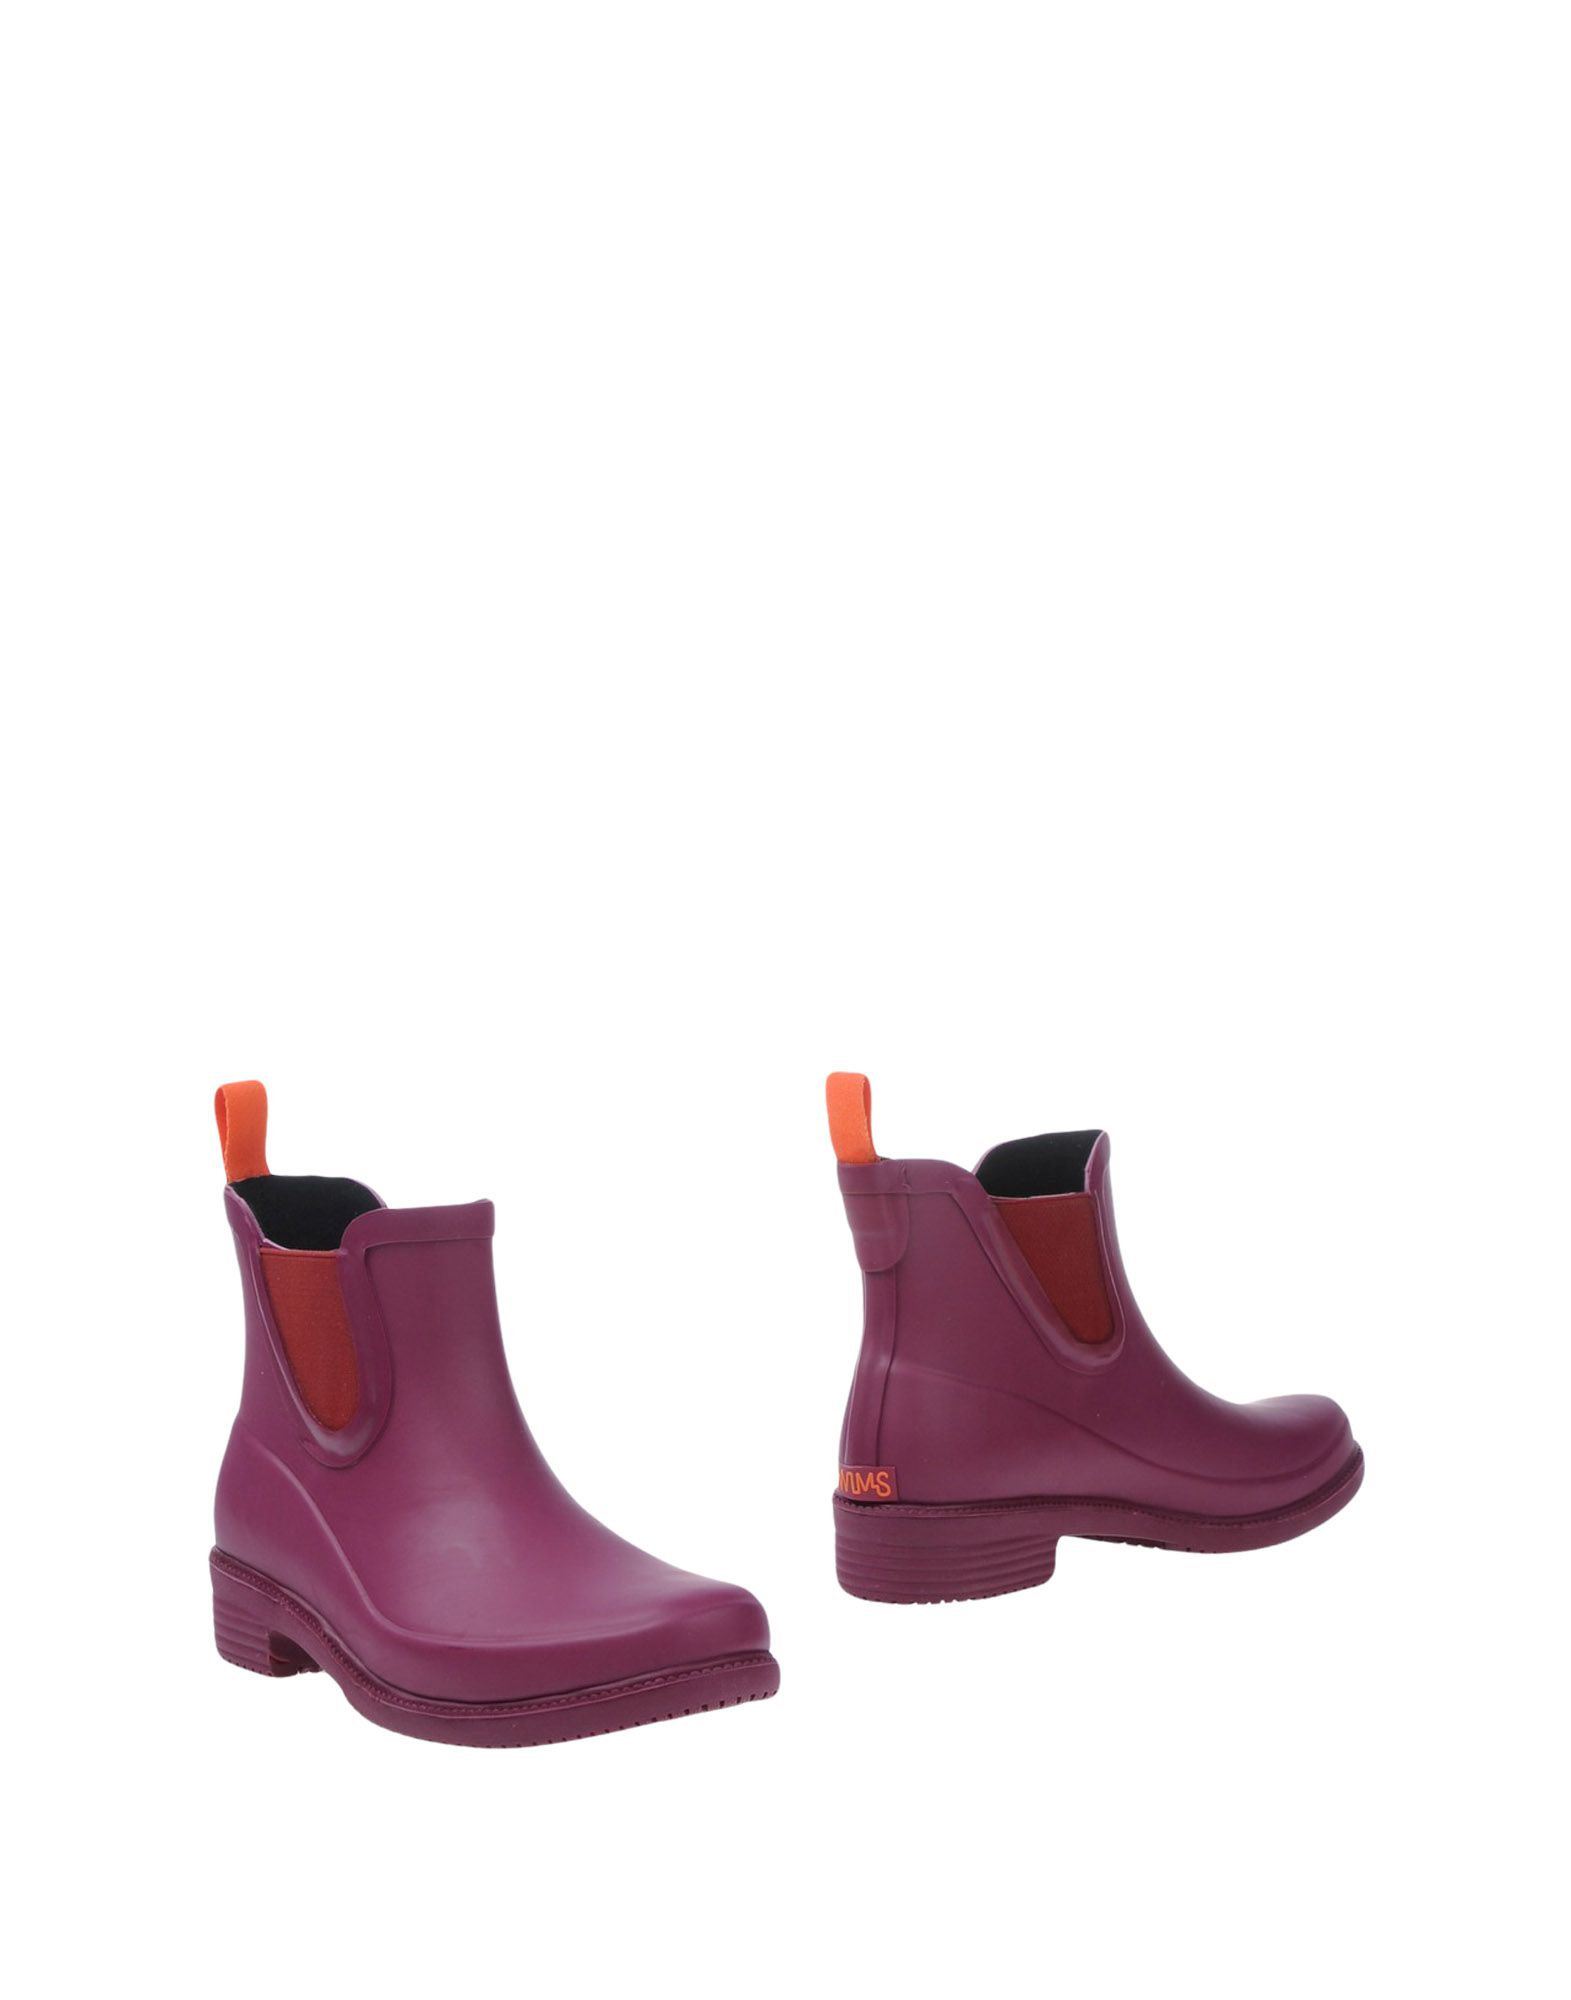 SWIMS Полусапоги и высокие ботинки george j love полусапоги и высокие ботинки